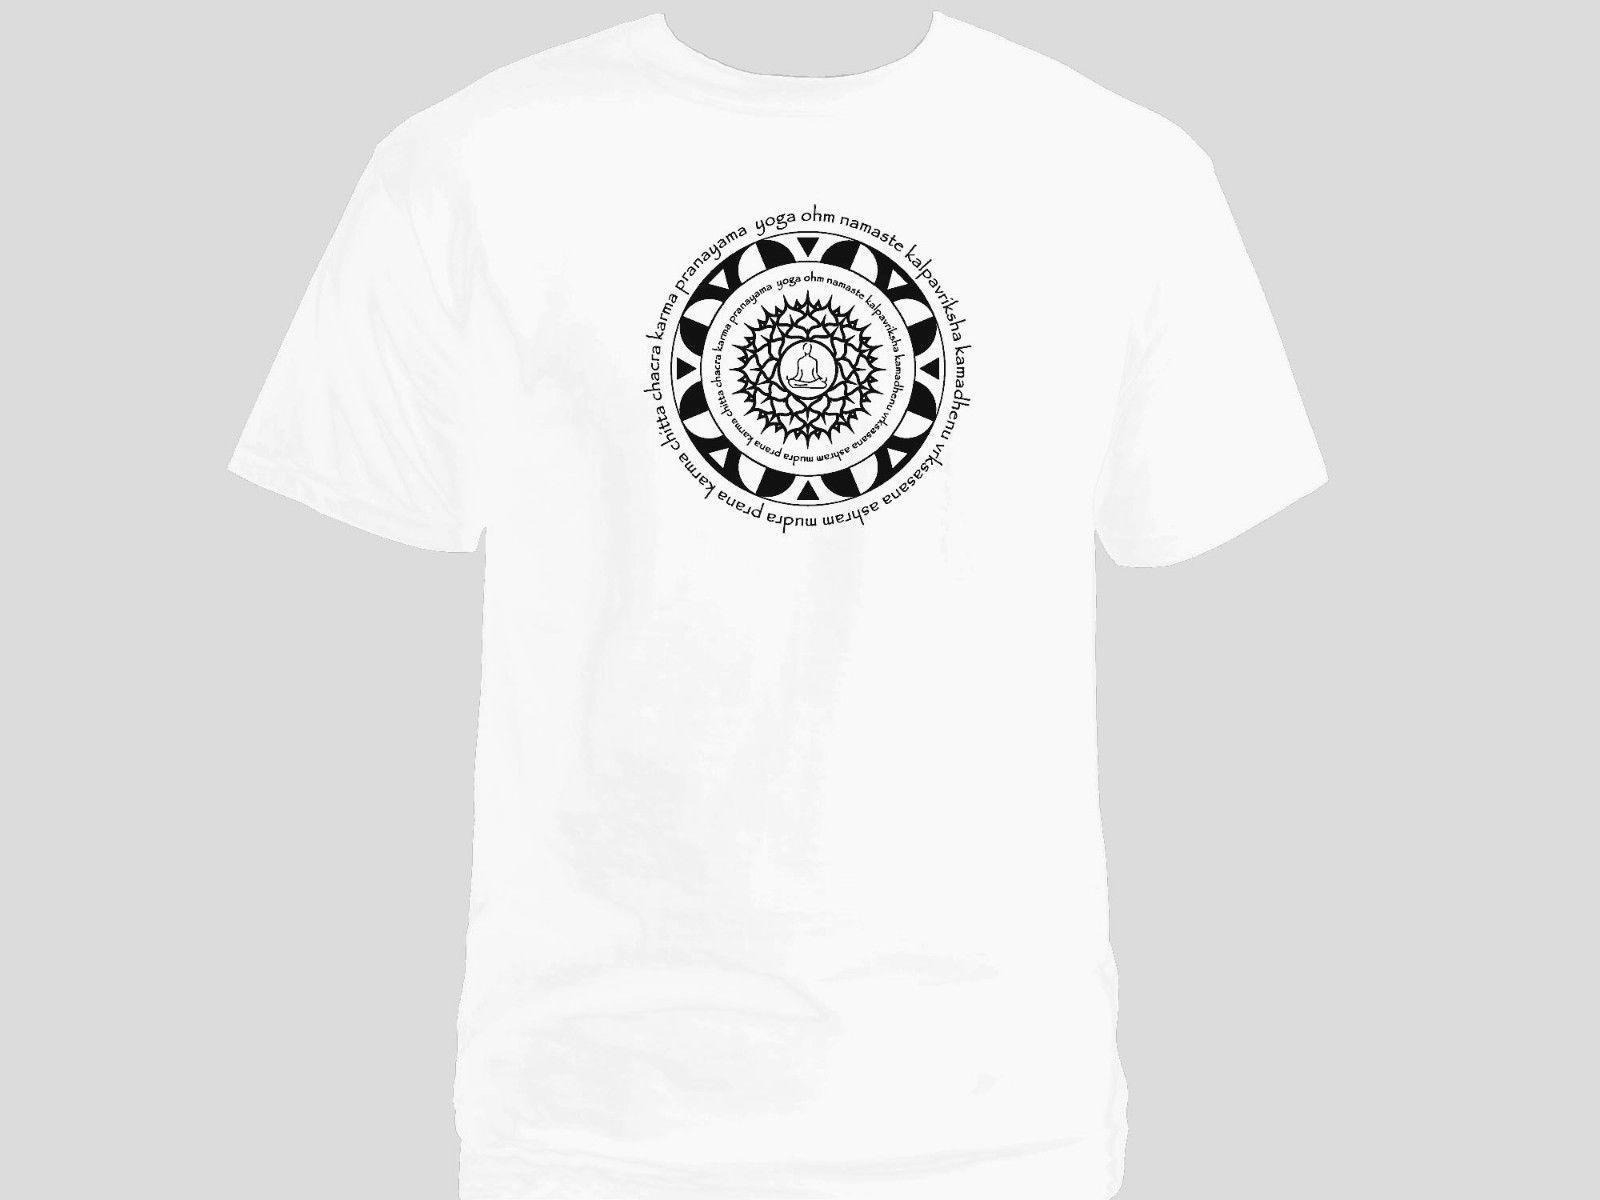 4a6d3ed7dd Sacred Art Mandala Lotus Posture & Yoga Terms Namaste Om Chakra White T  Shirt Funny Unisex Fun Shirts T Shirts Online Shopping From Young_ten, ...